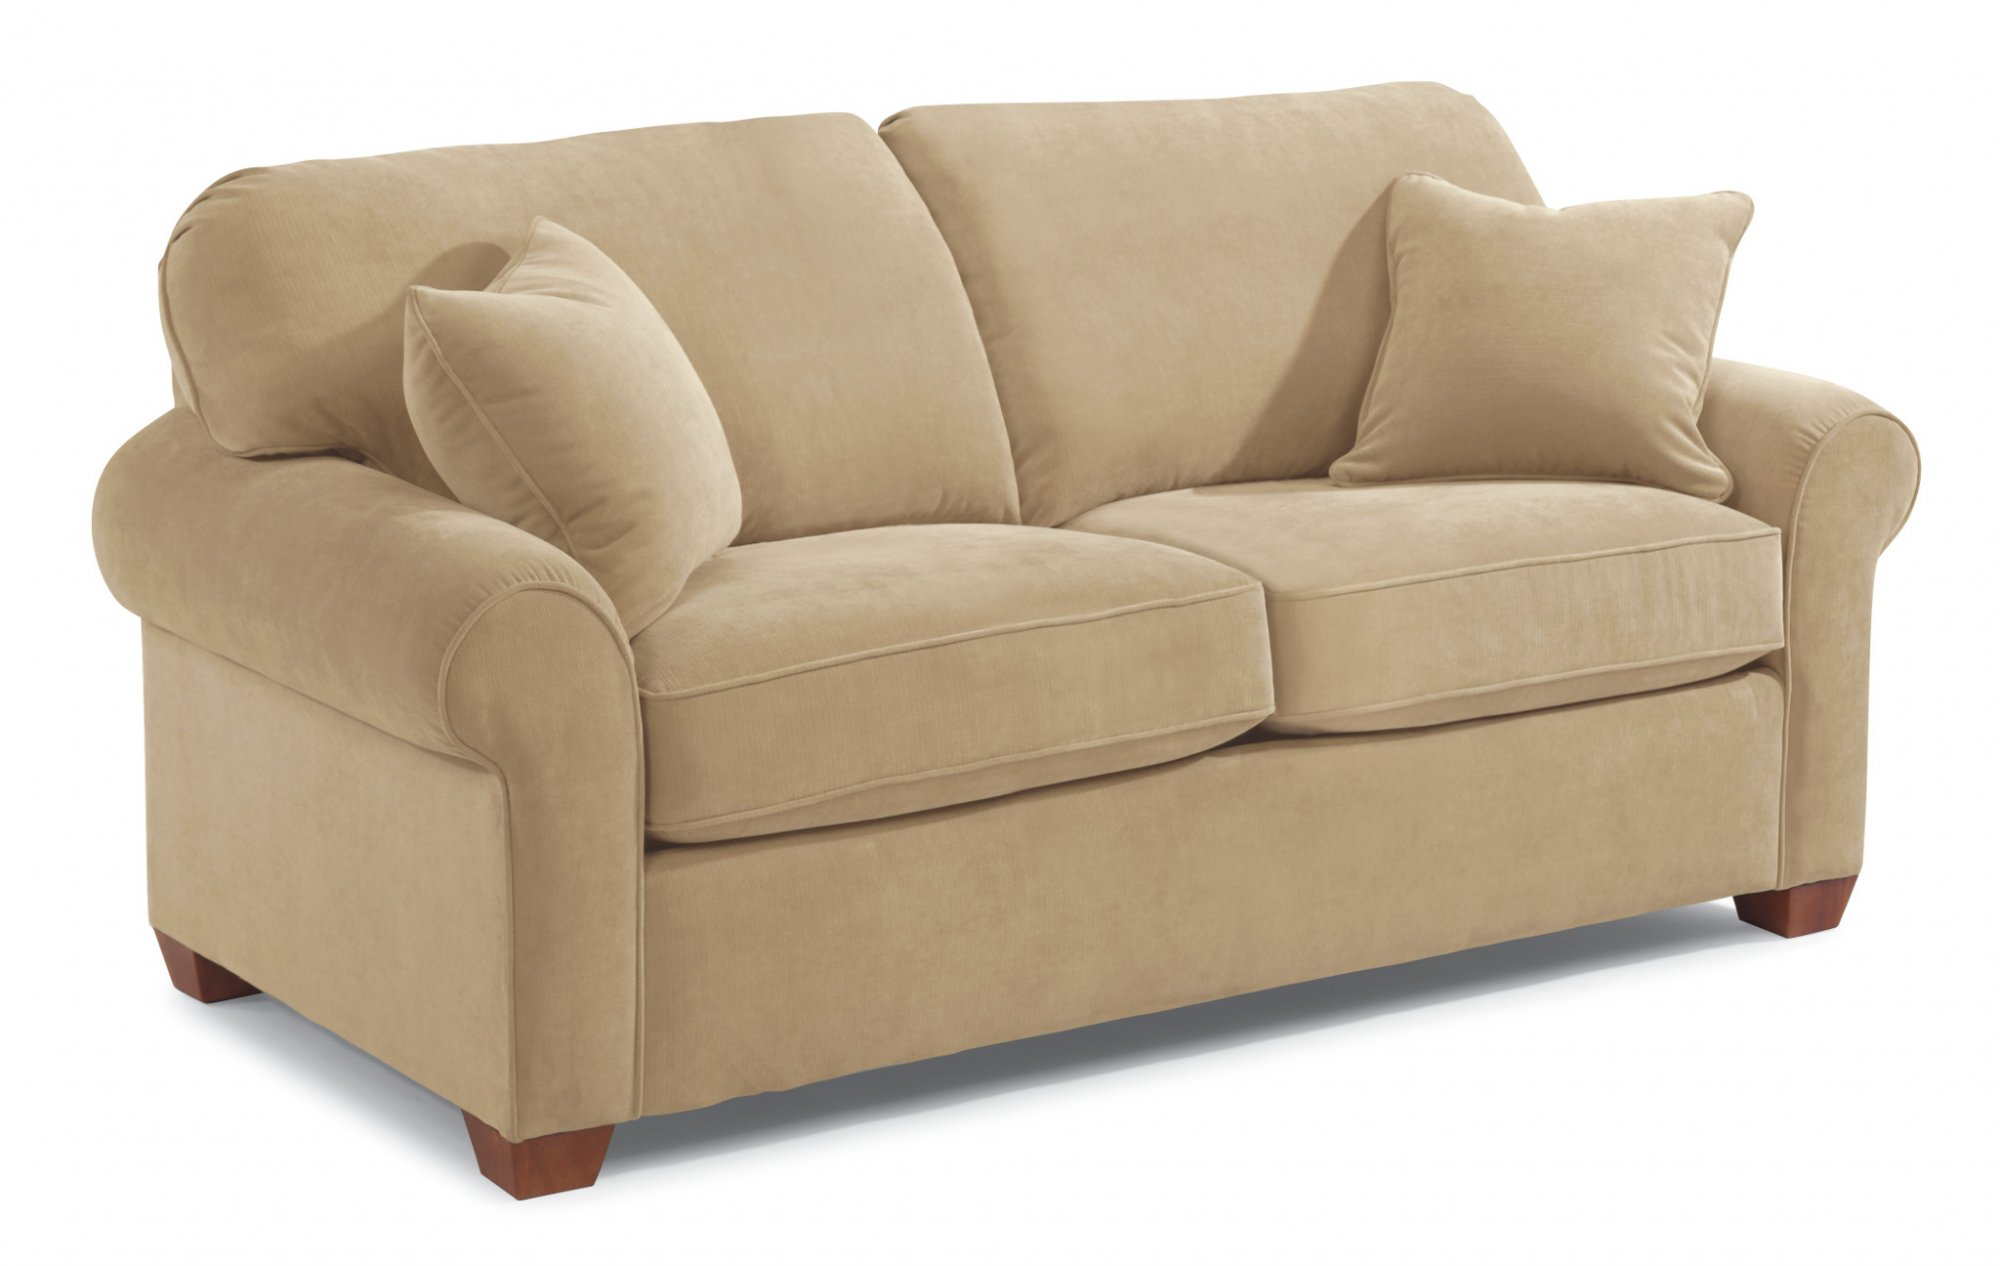 Flexsteel Thornton  Fabric Full Sleeper